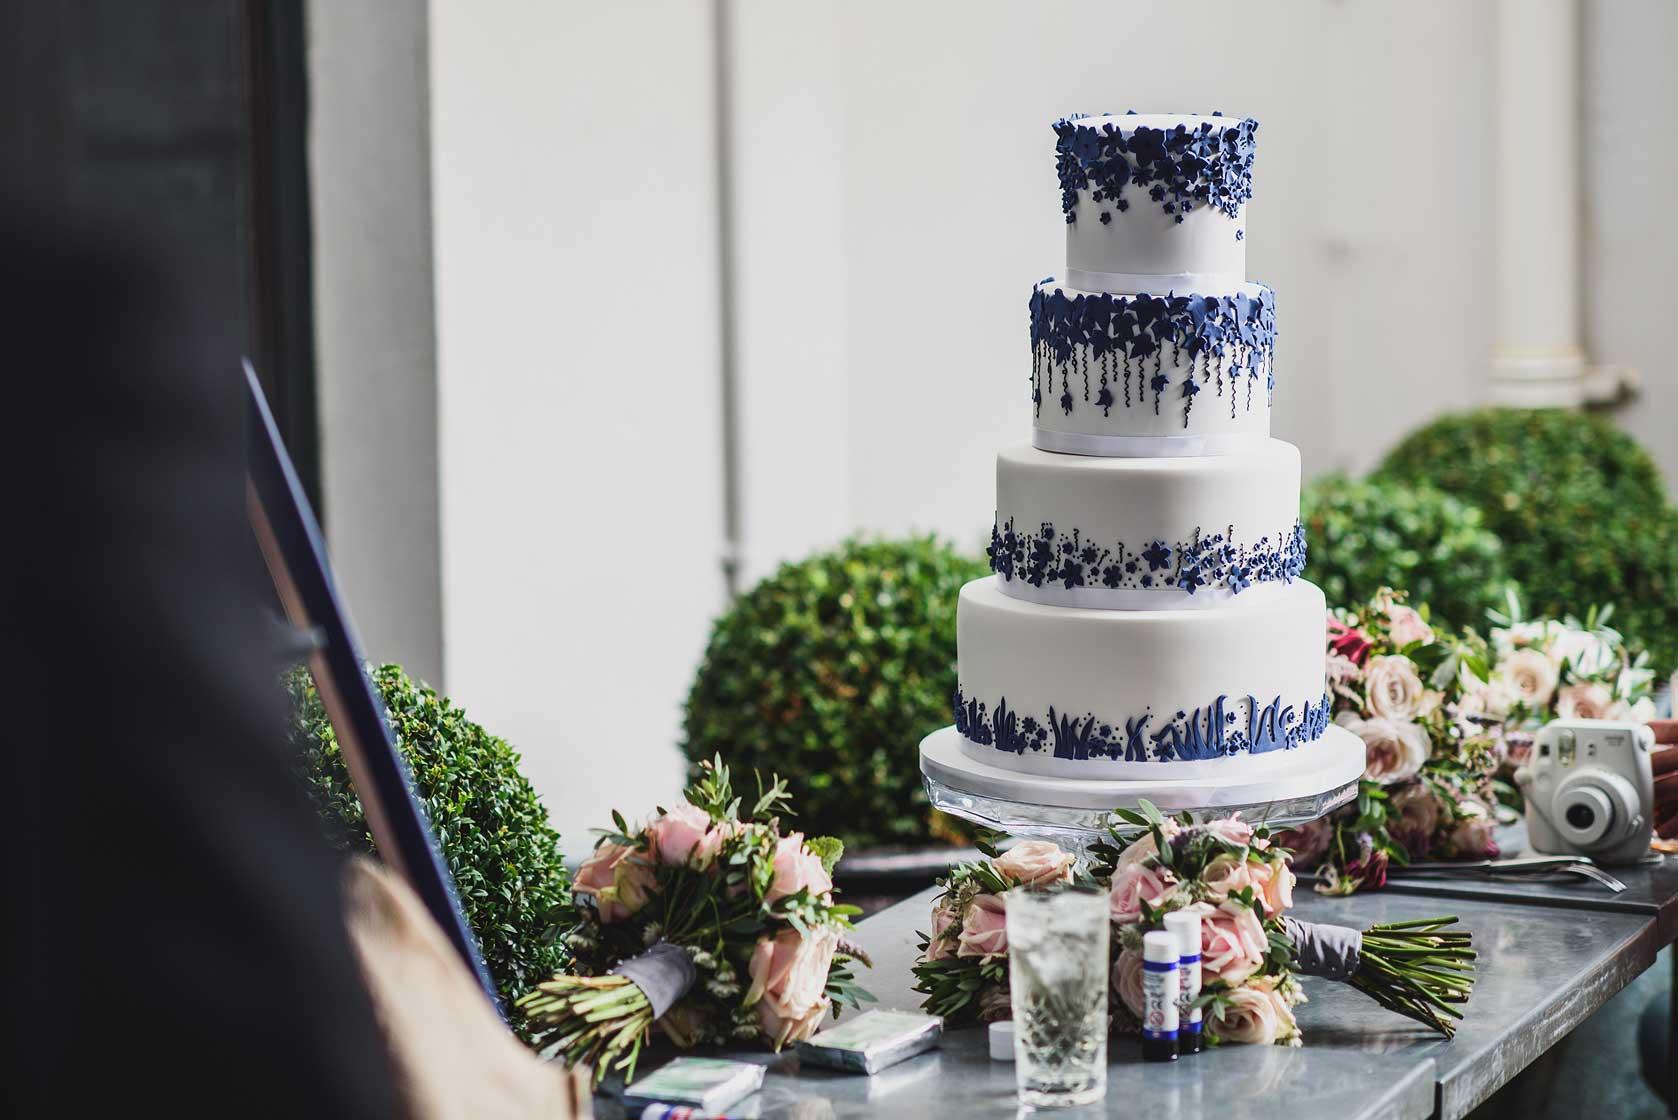 Summer wedding at No 131 Cheltenham